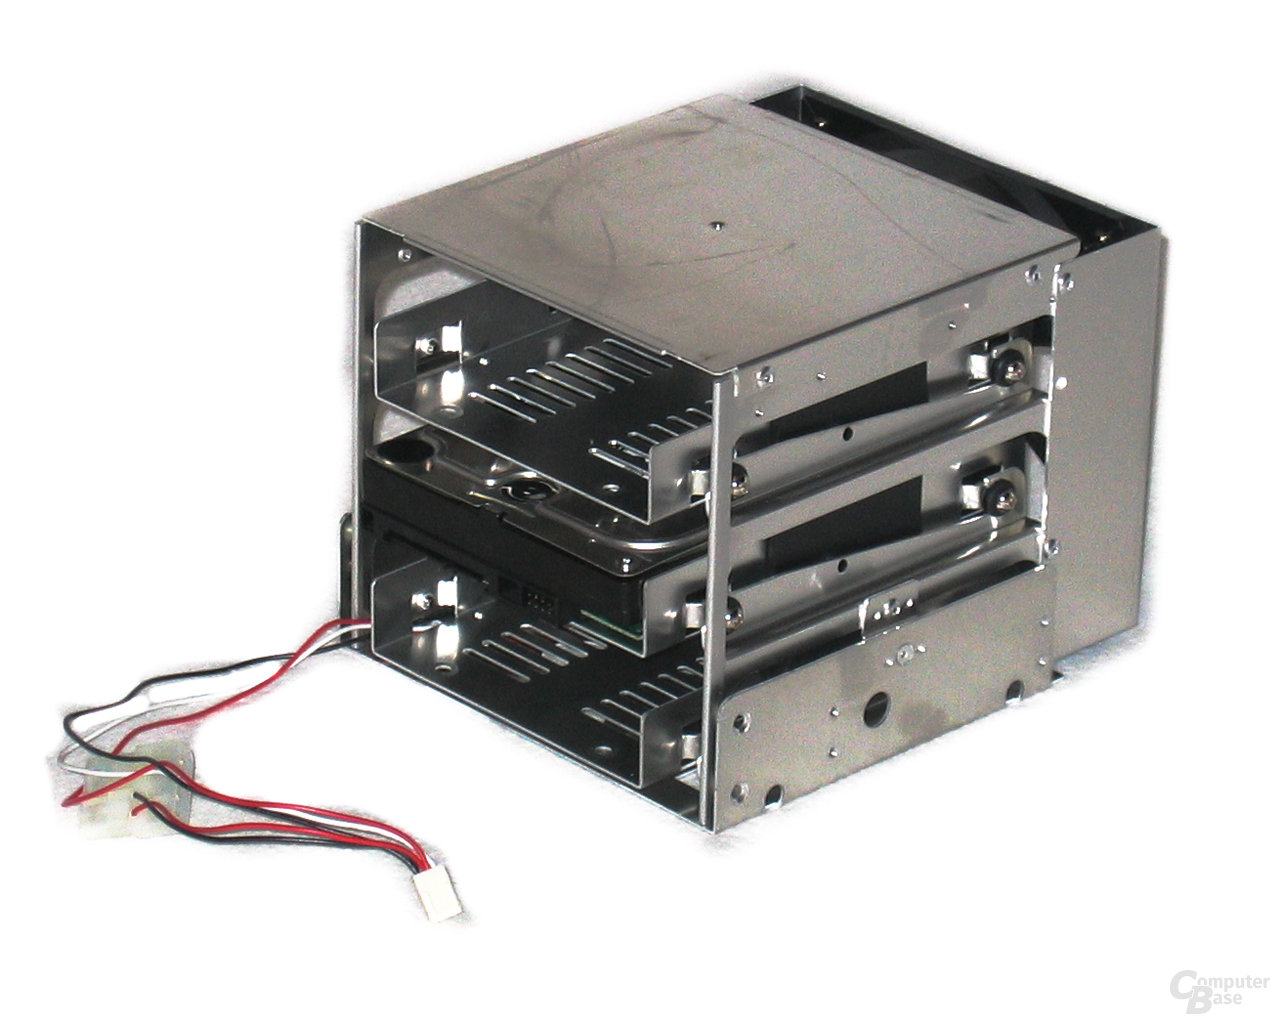 Lian Li Armorsuit PC-P50 – Festplattenkäfig